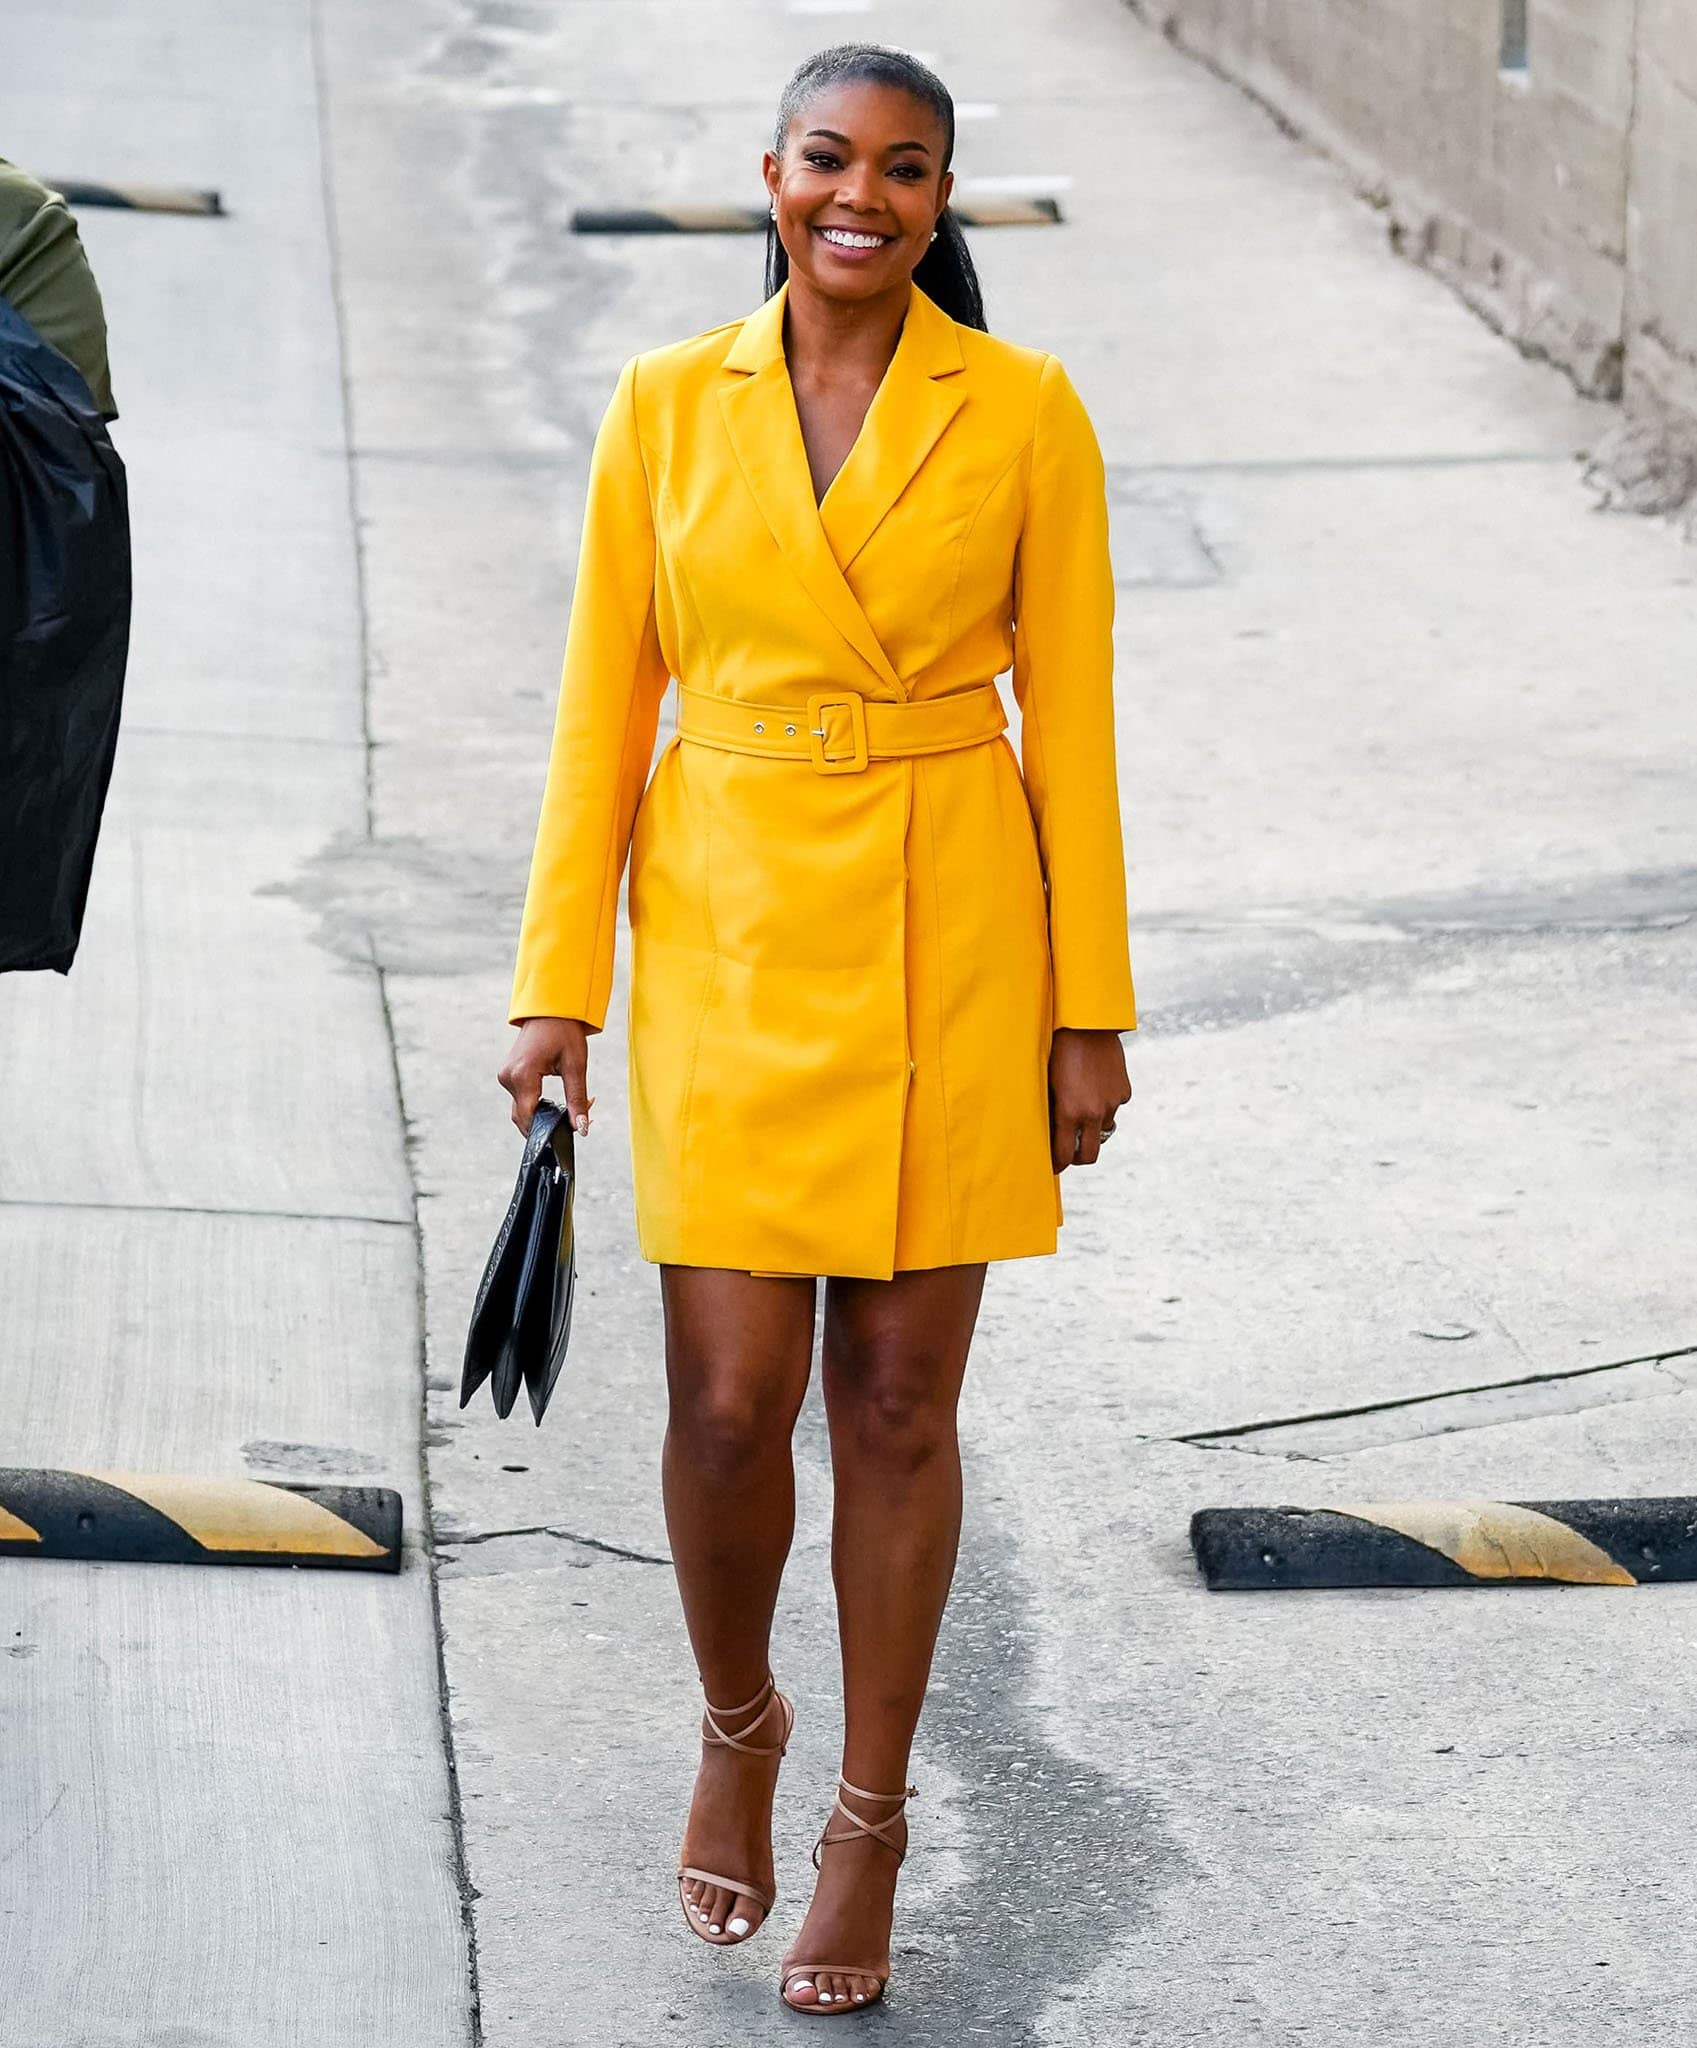 Gabrielle Union swaps her fringe dress for a yellow coat dress outside Jimmy Kimmel Live studio on September 28, 2021